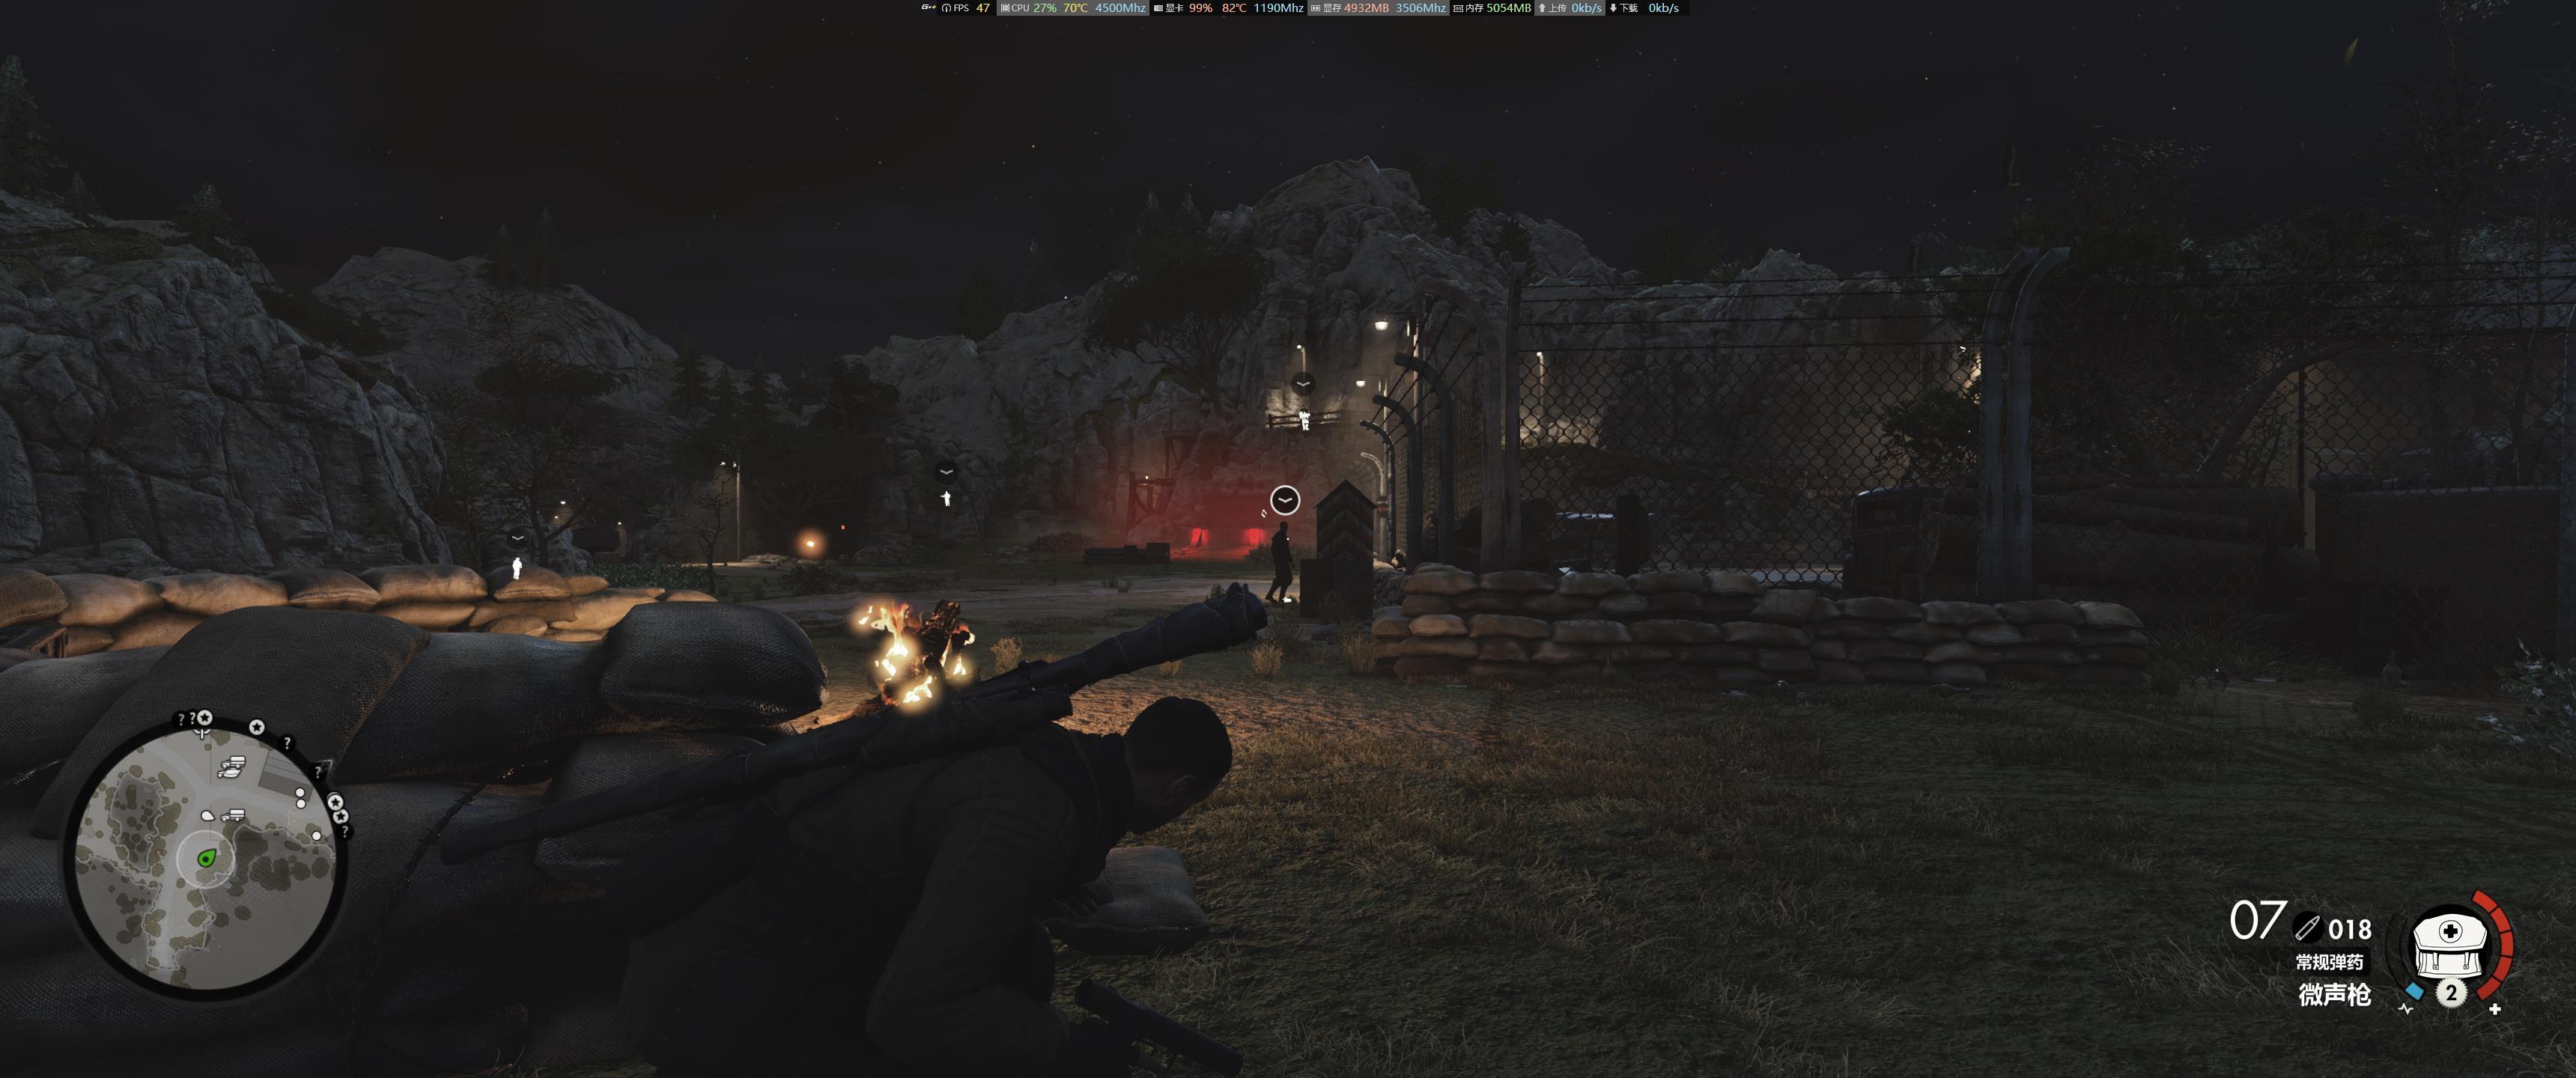 SniperElite4_DX11-01-20-42-44.jpg